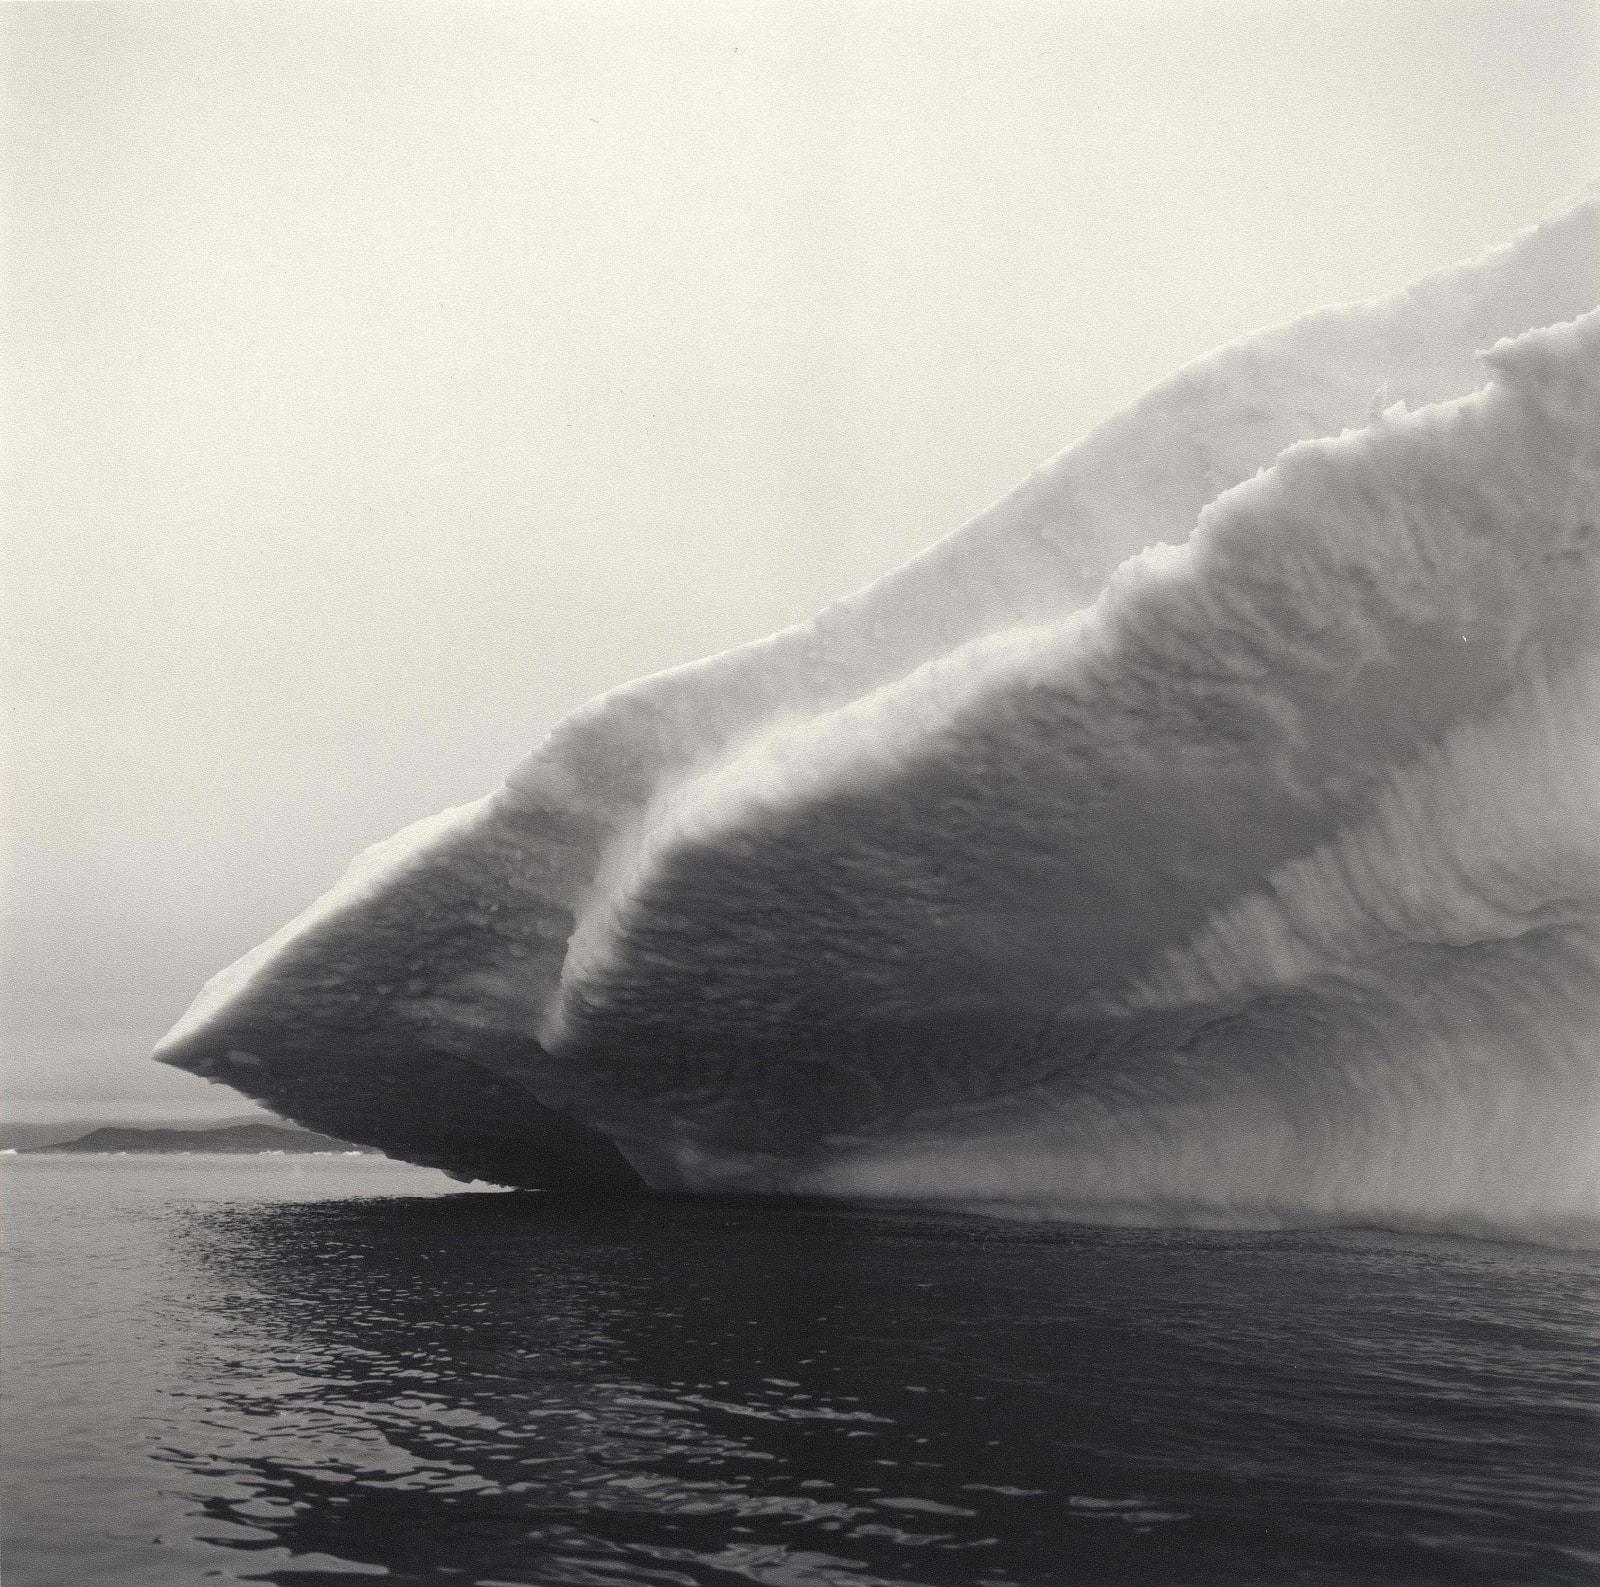 Lynn Davis photograph of iceberg in Disko Bay, Greenland, in diamond shape